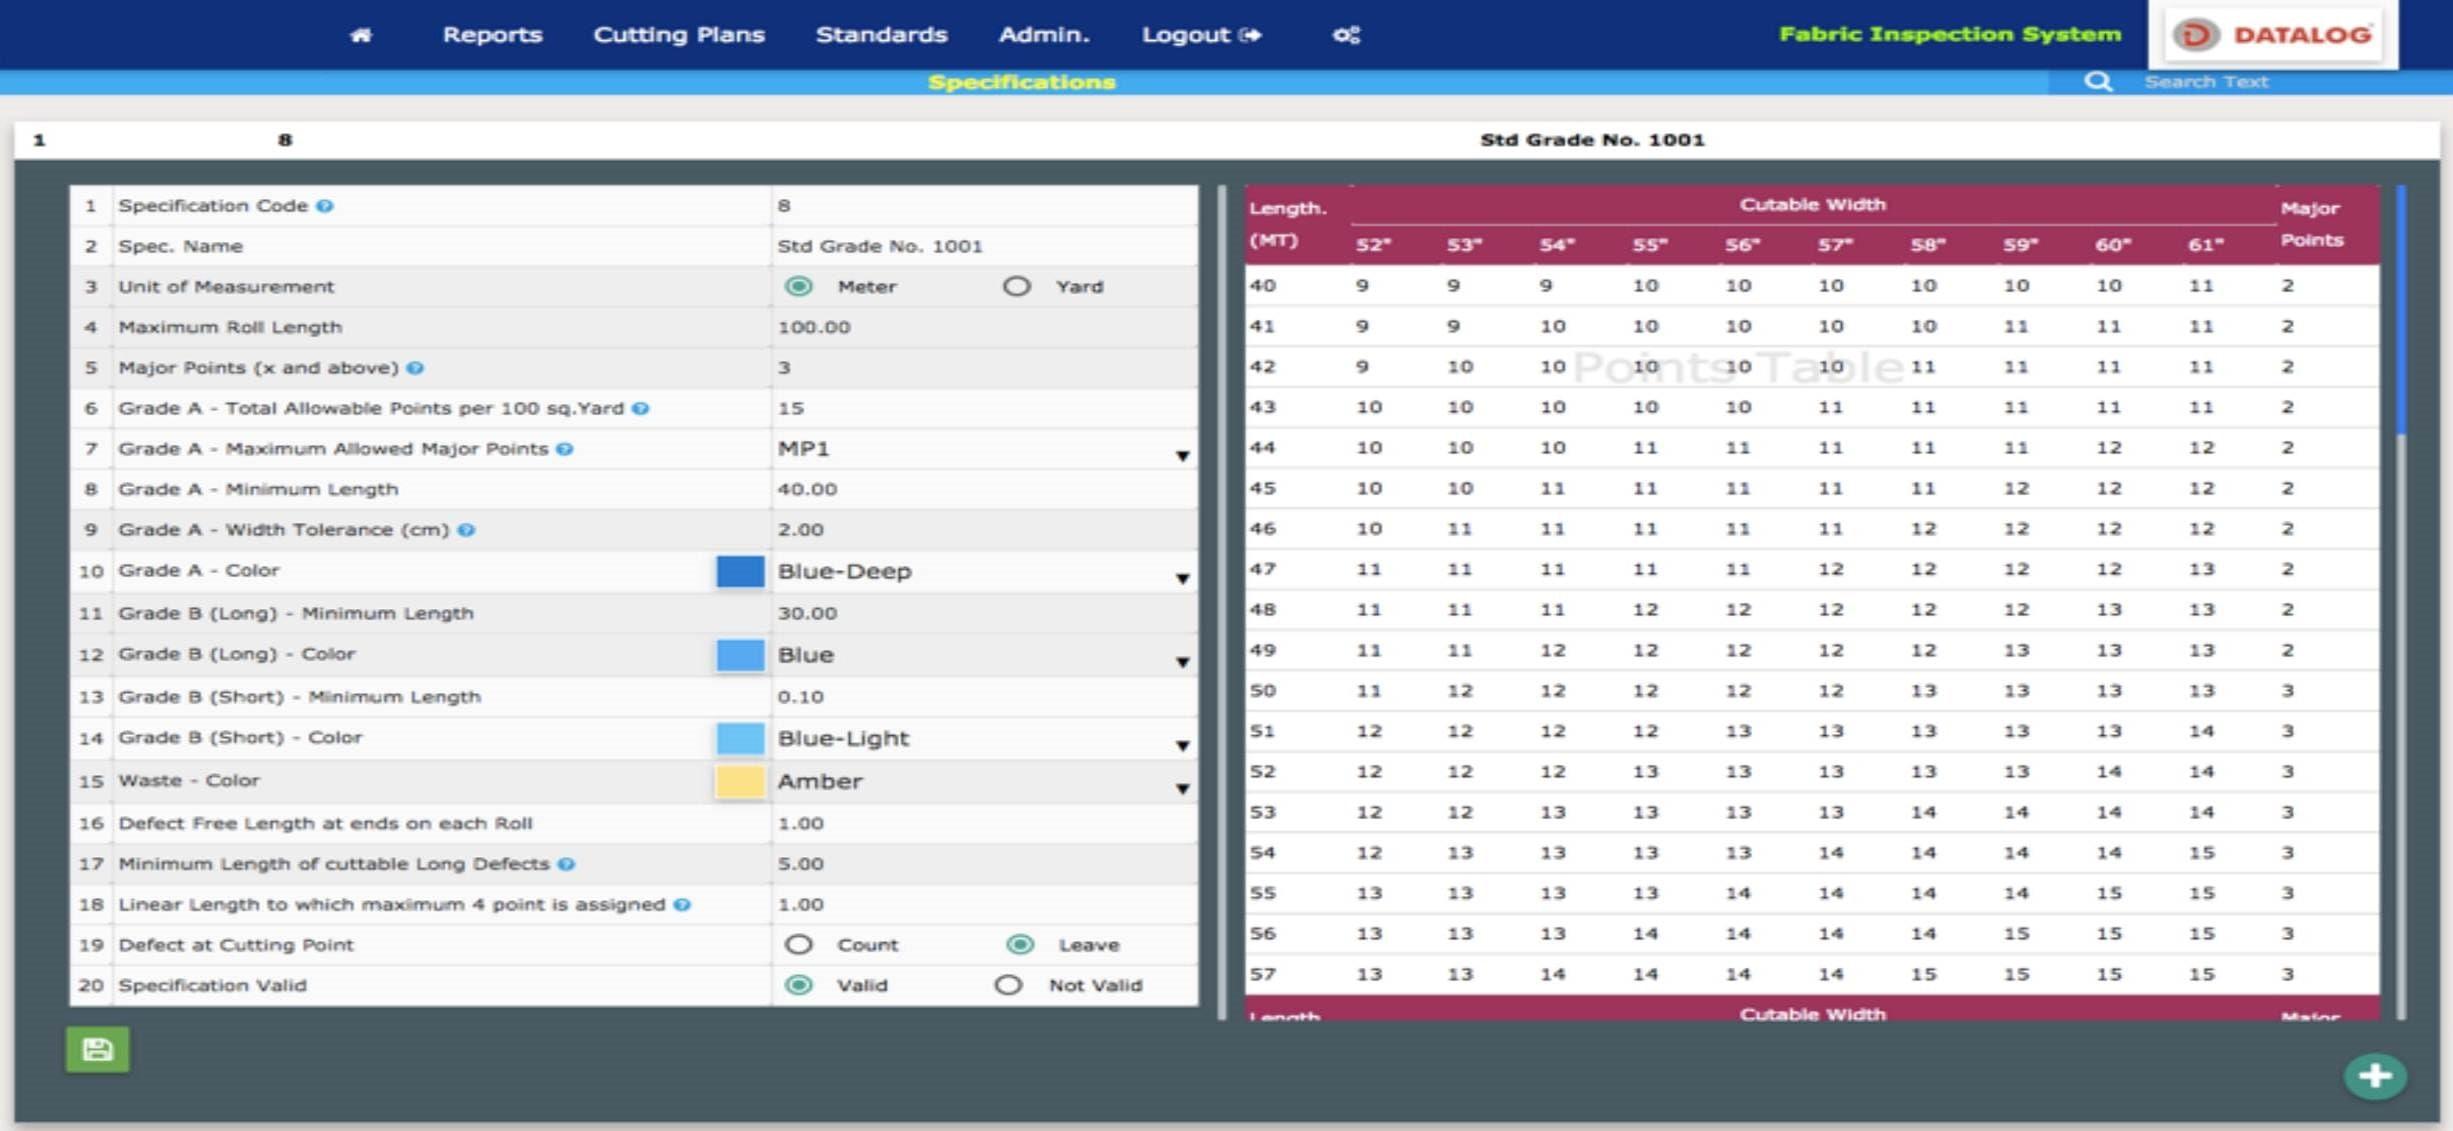 Datalog Reports - Grade Standards